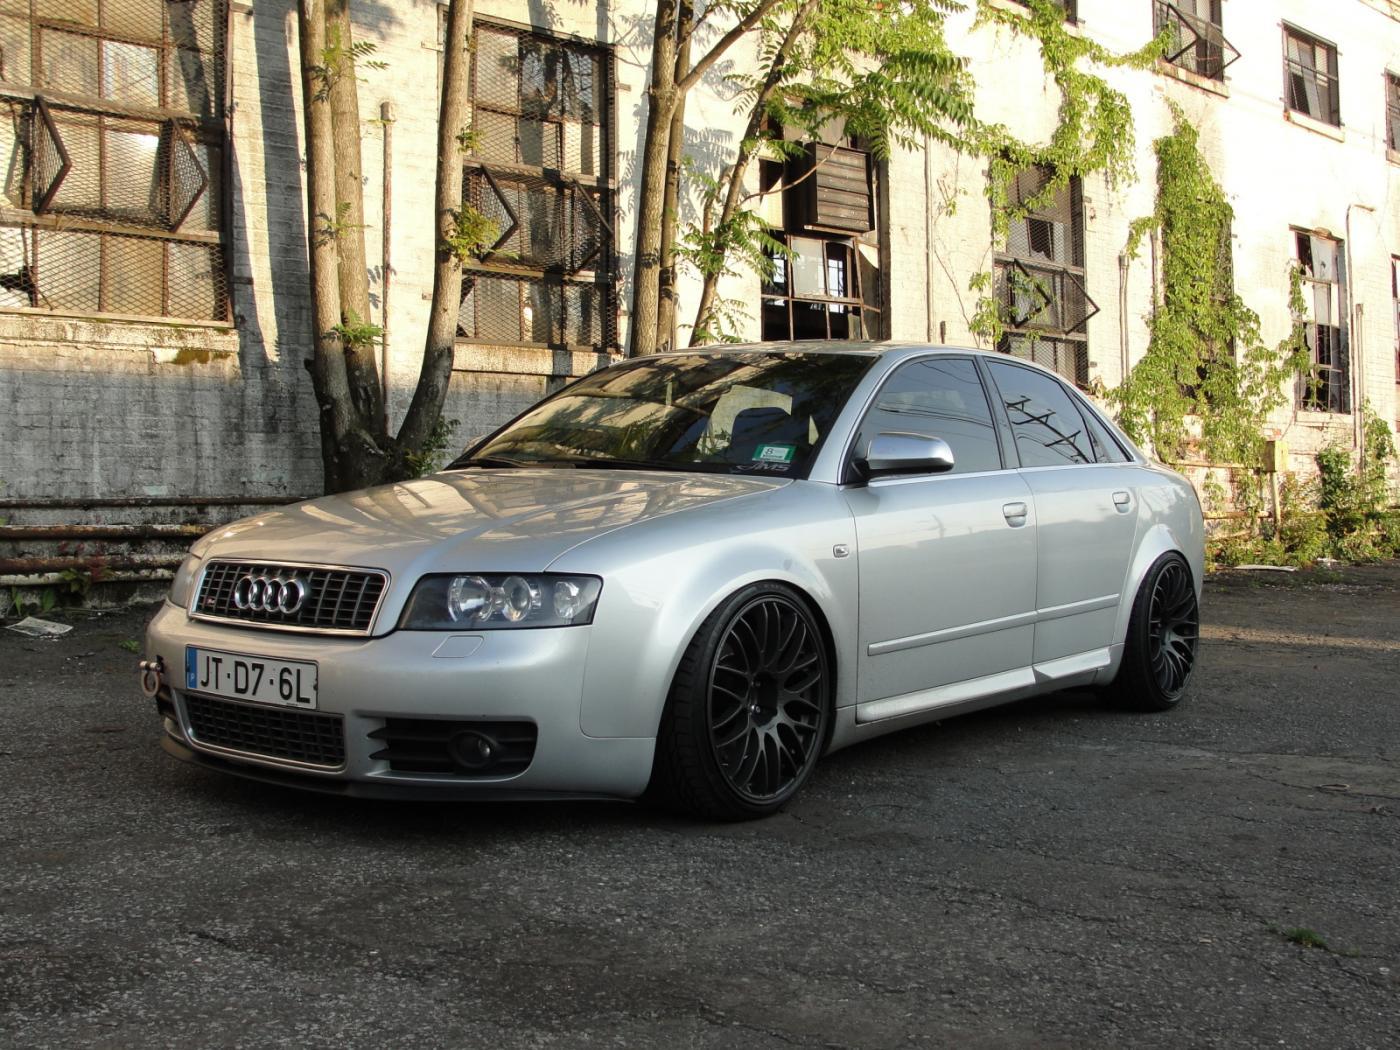 Audi-S4-B6-11